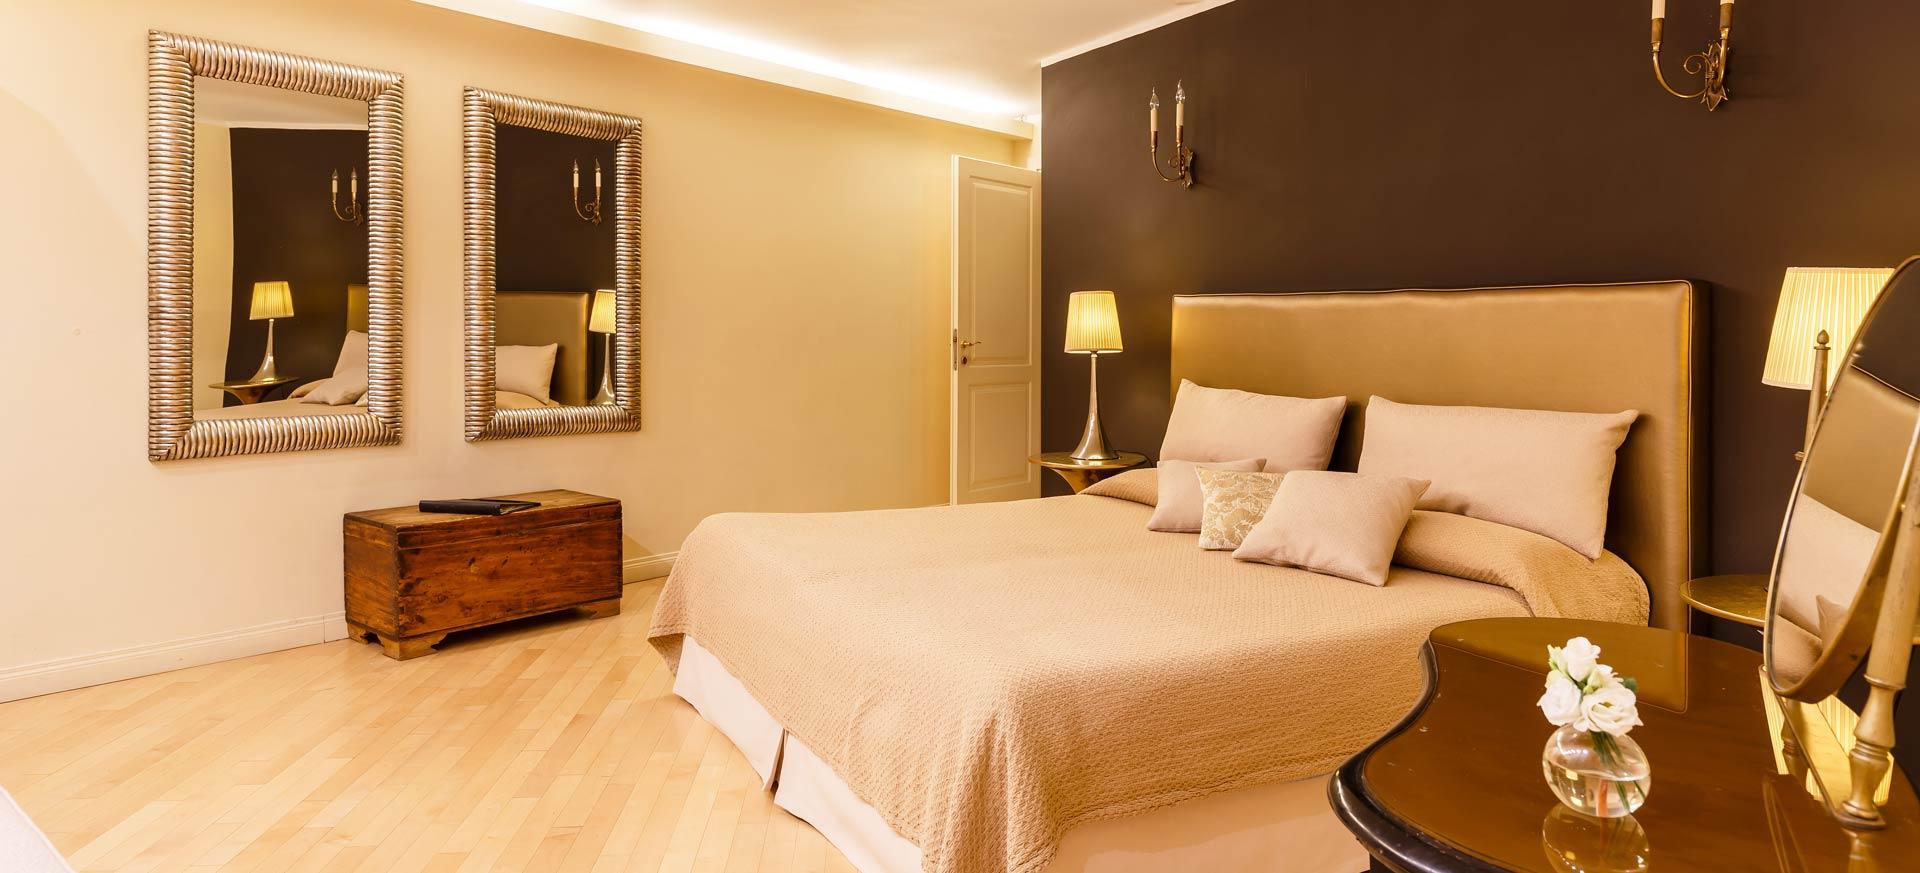 h tel de charme palerme sicile hote italia. Black Bedroom Furniture Sets. Home Design Ideas